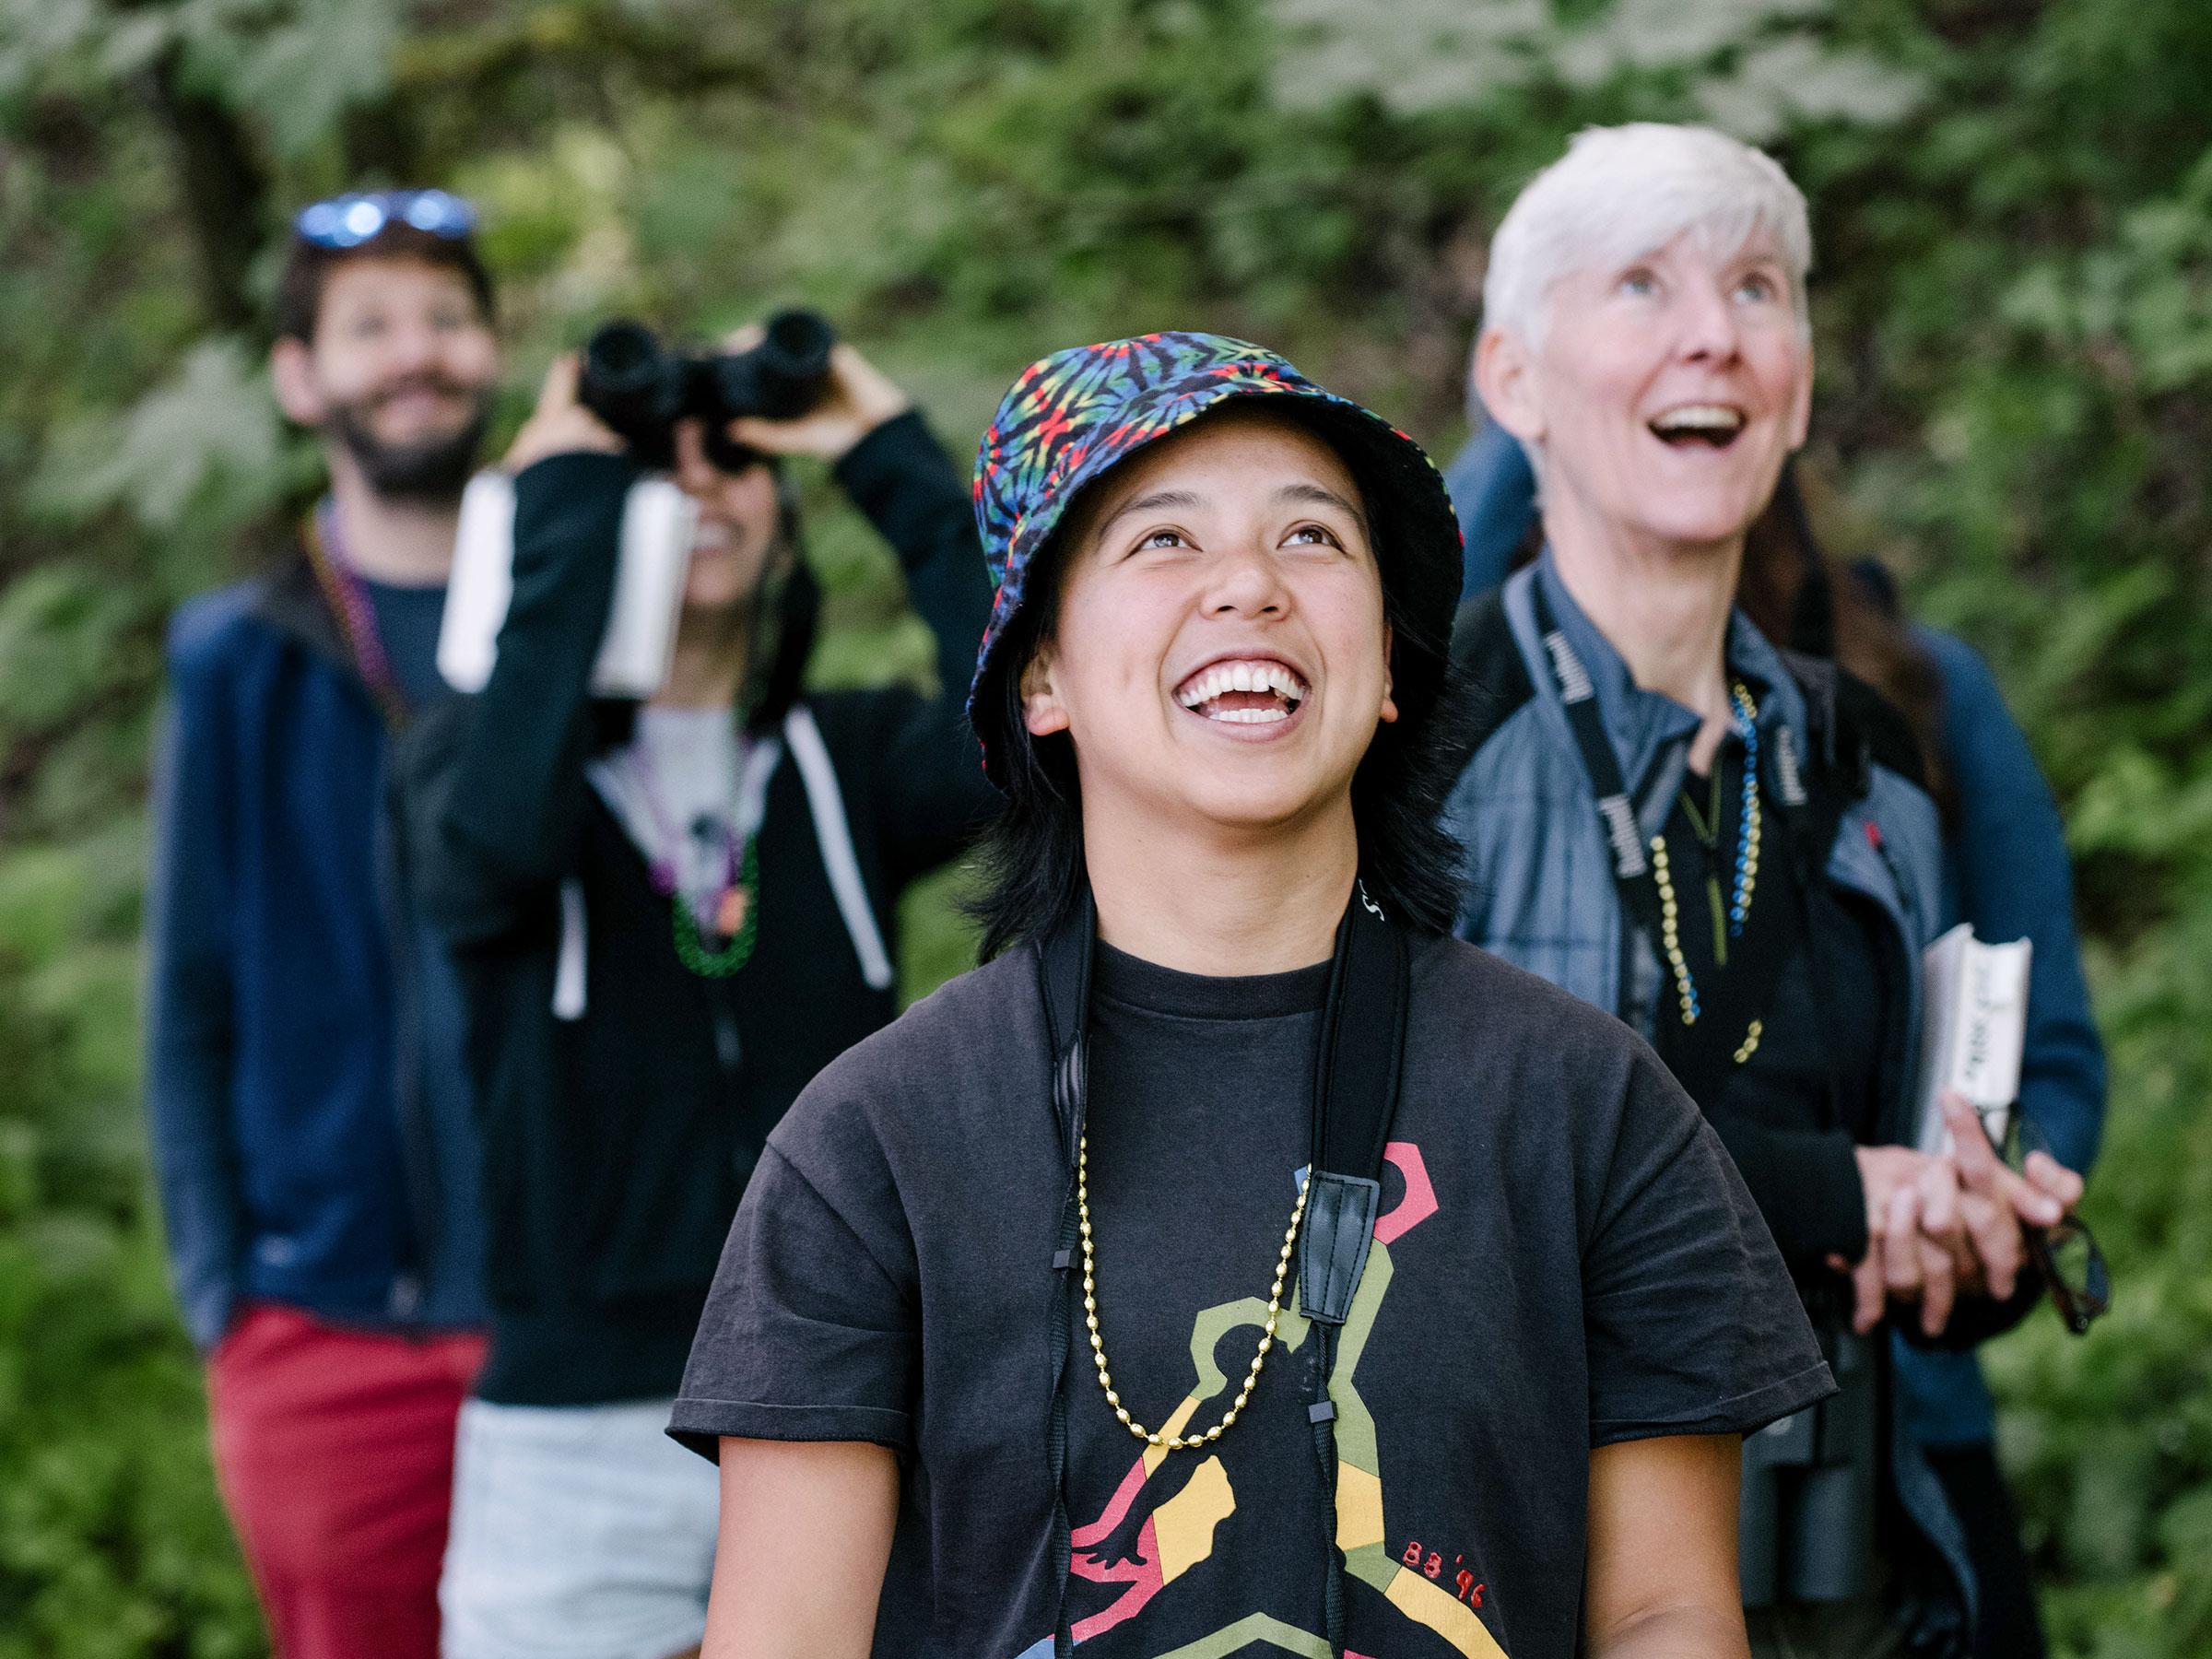 Let's Go Birding Together event in Seattle. Grant Hindsley